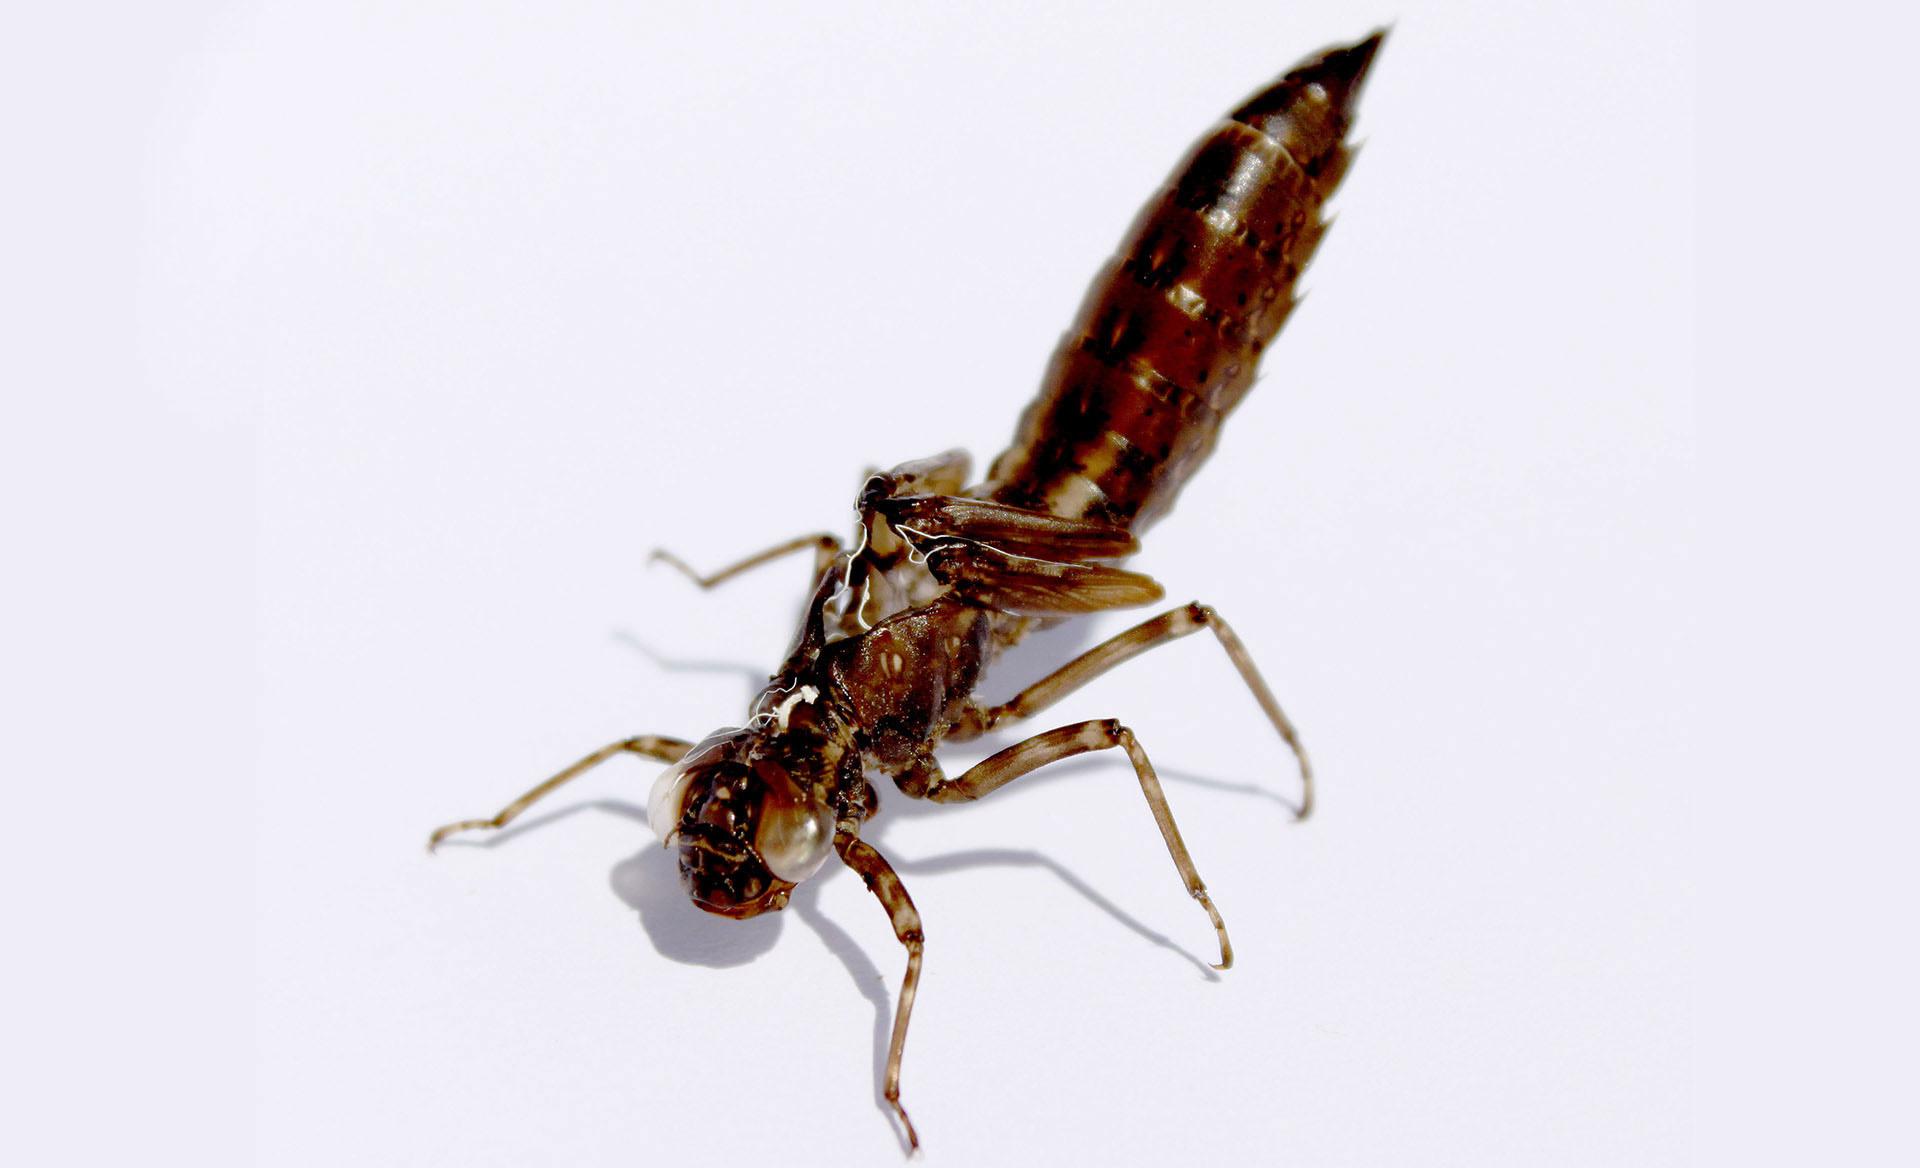 Dragonfly Larvae after it has shed it exoskeleton